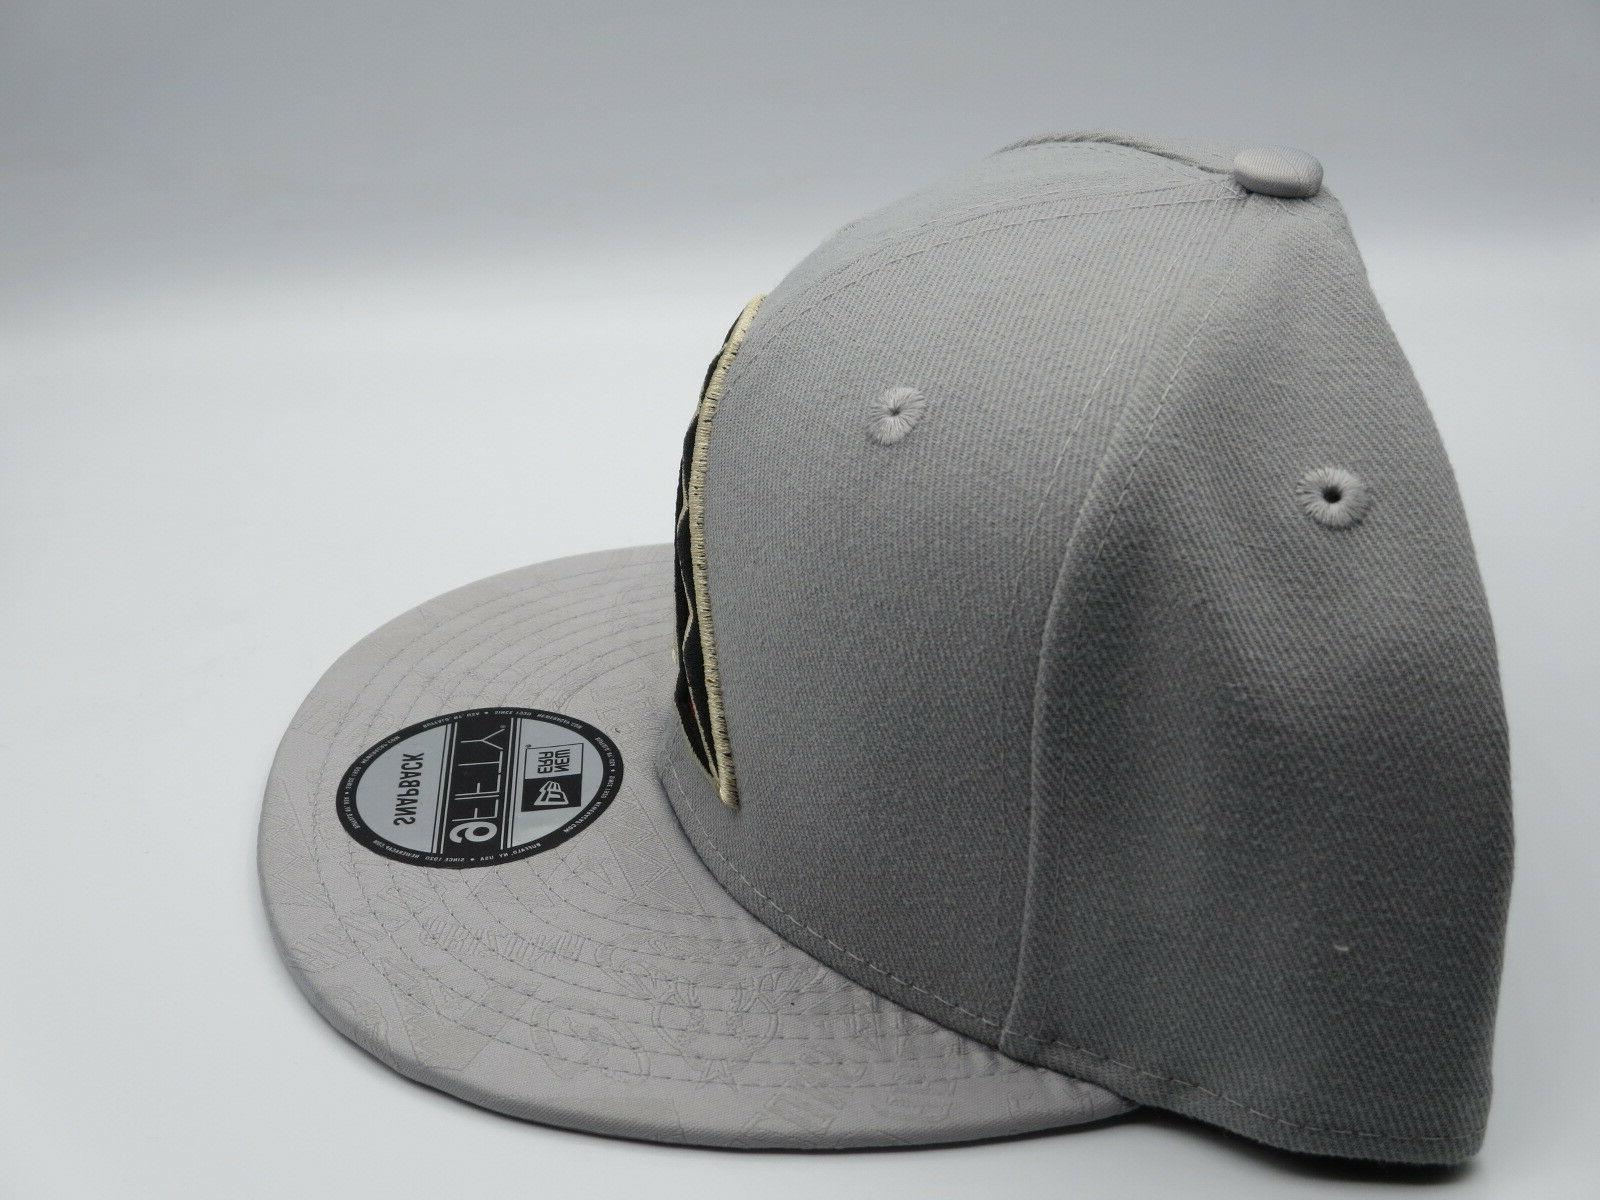 Arizona 1 MLB Vintage Retro Snapback Hat